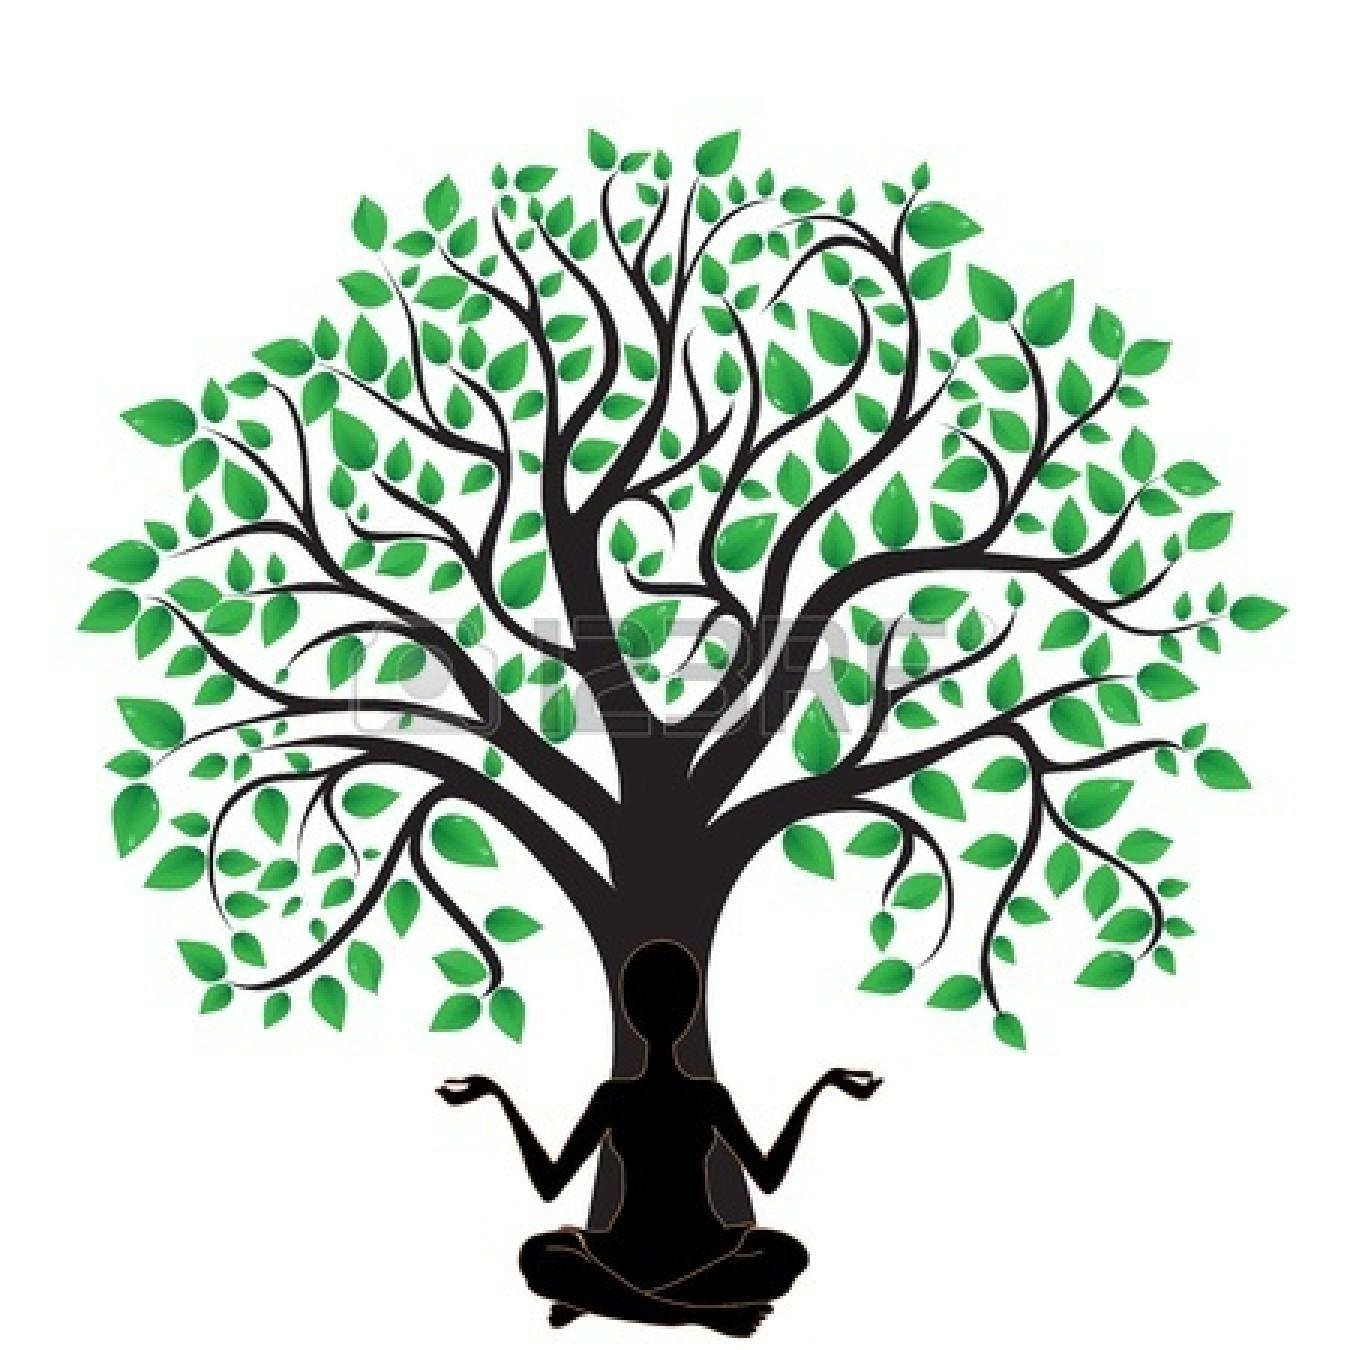 1350x1350 Family Tree Silhouette